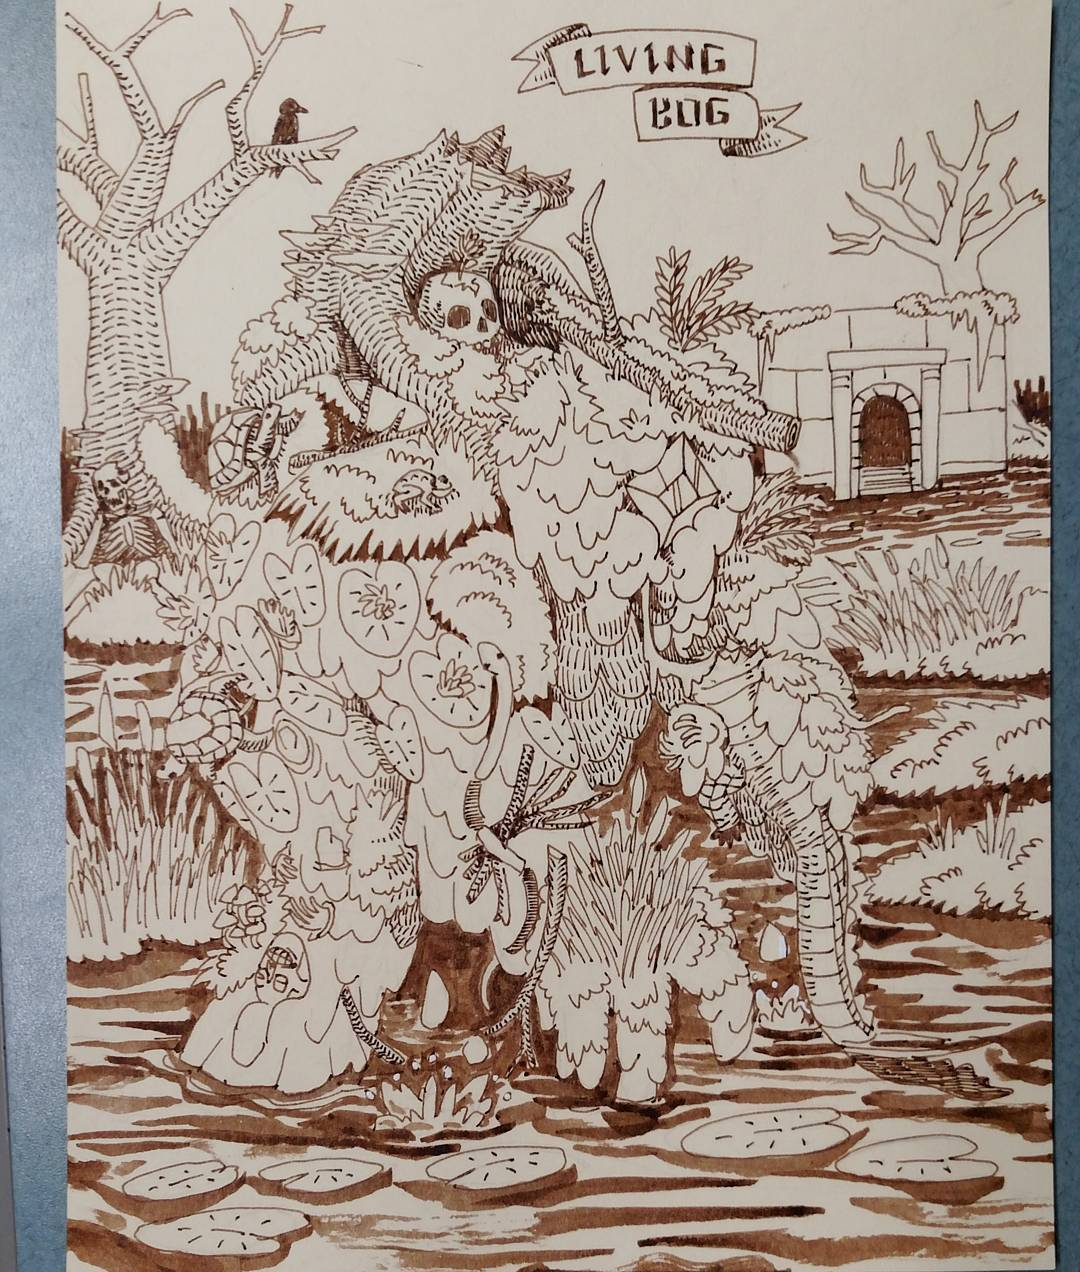 "redjarojam ""Swamp Temple Living Bog"" - by Jared DeCosta (redjarojam) www.instagram.com/redjarojam (2016-2019) © dell'autore tutti i diritti riservati"